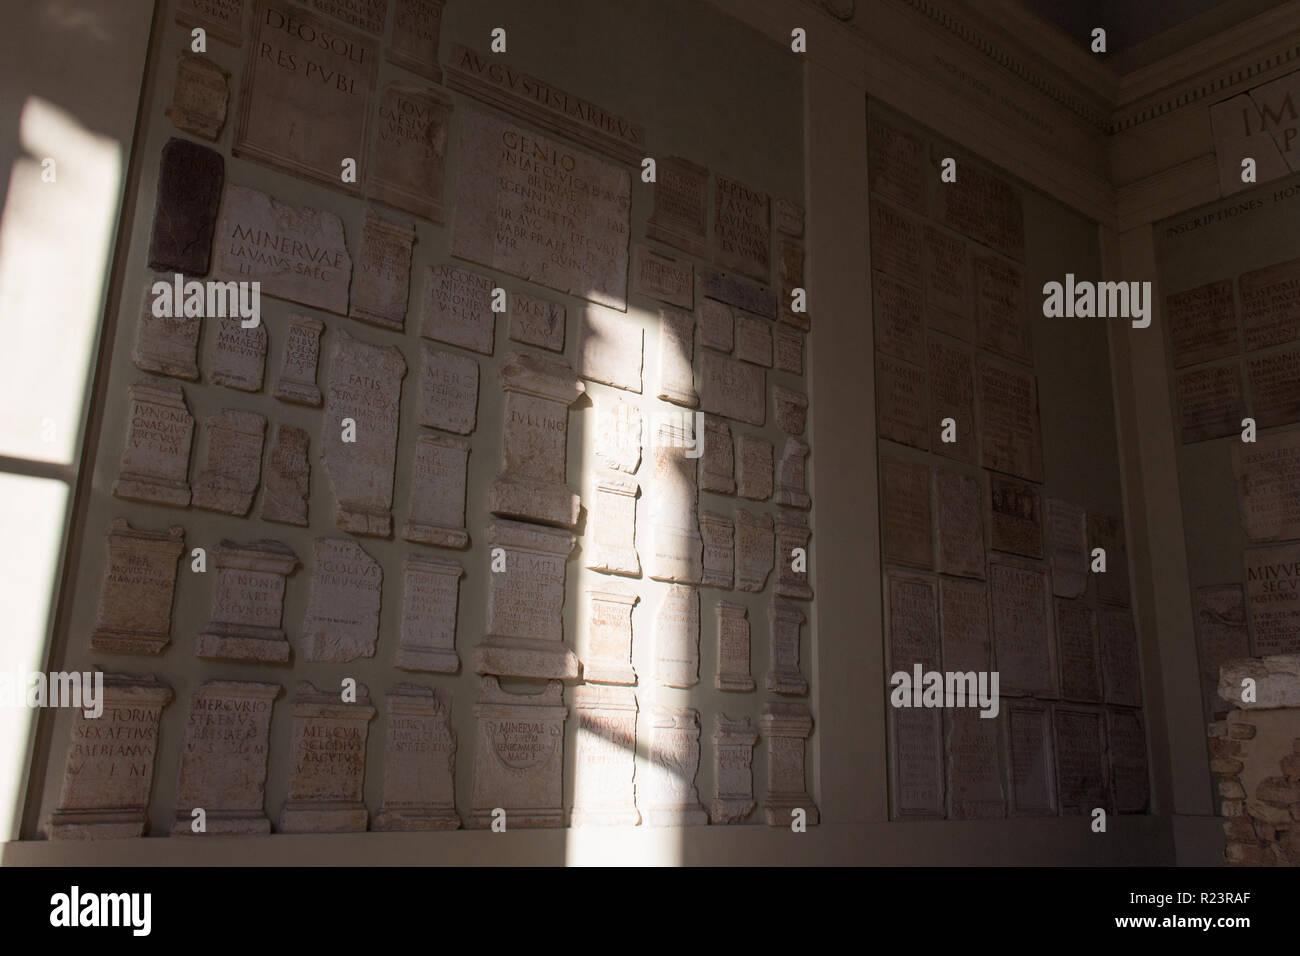 Italy, Brescia - December 24 2017: the view of the lapidarium walls of the Capitolium in Brescia on December 24 2017 in Brescia, Lombardy, Italy. Stock Photo